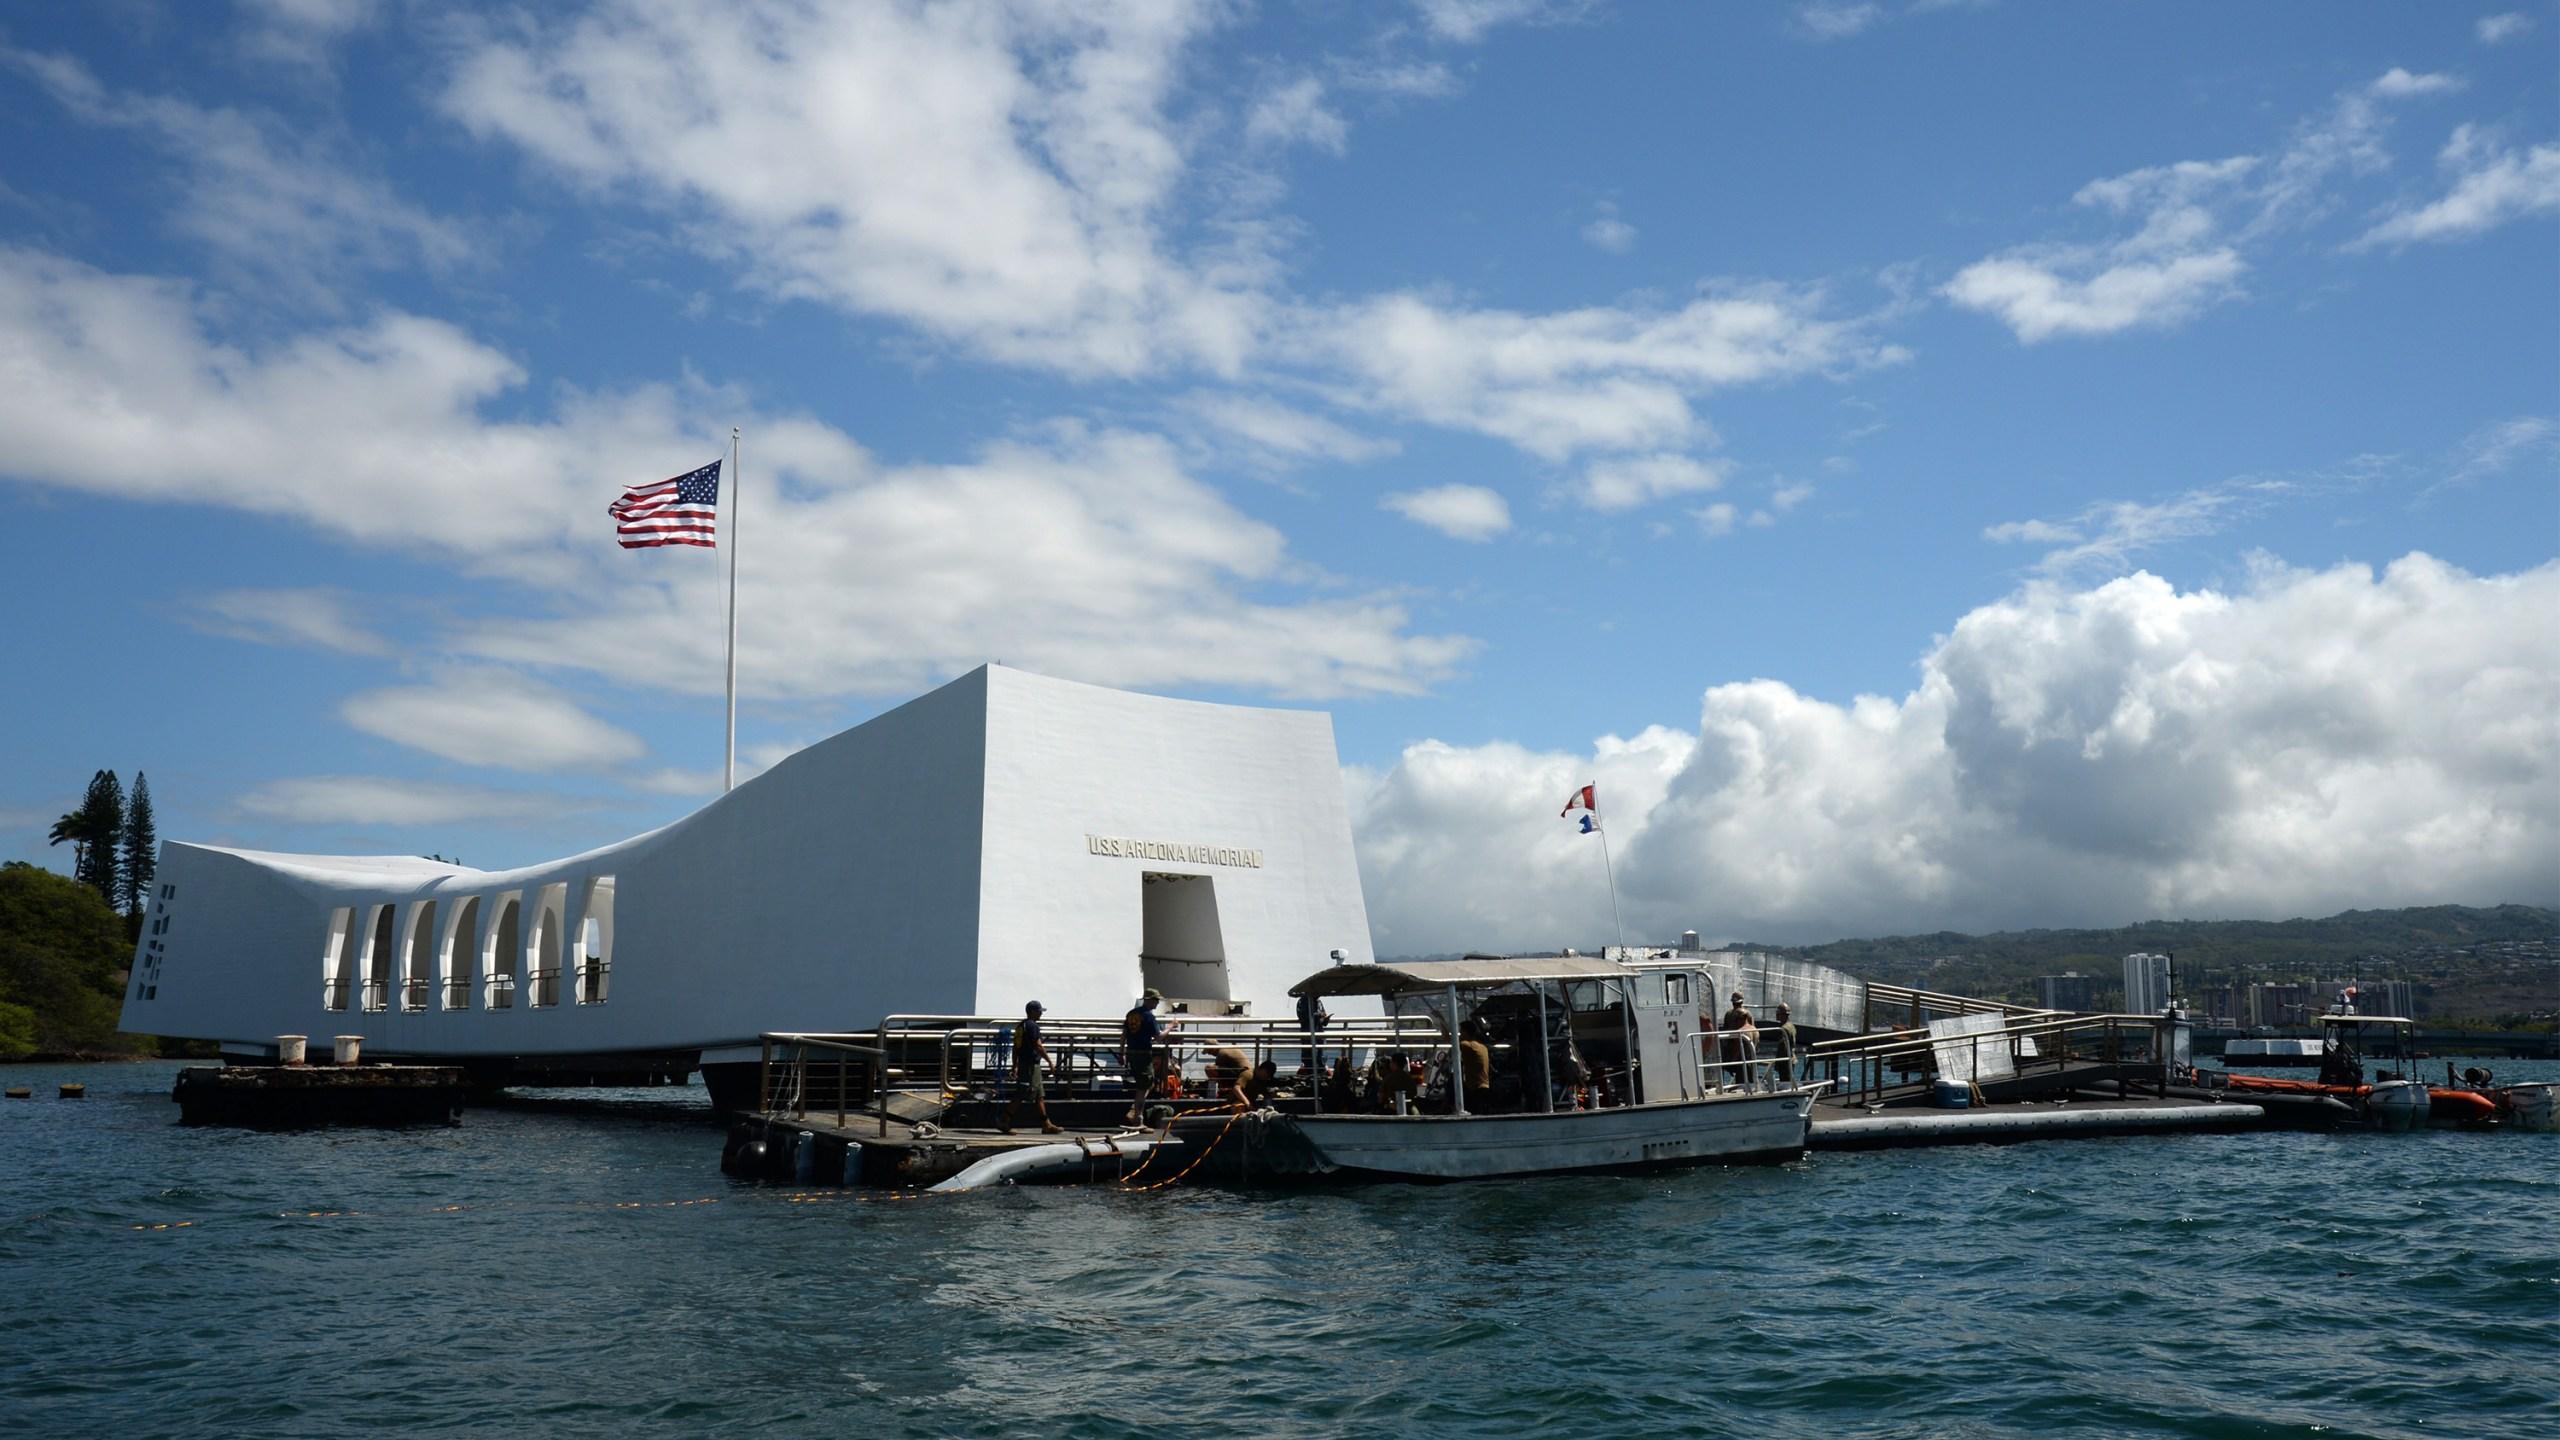 Sailors work to repair the floating dock next to the USS Arizona Memorial_98123